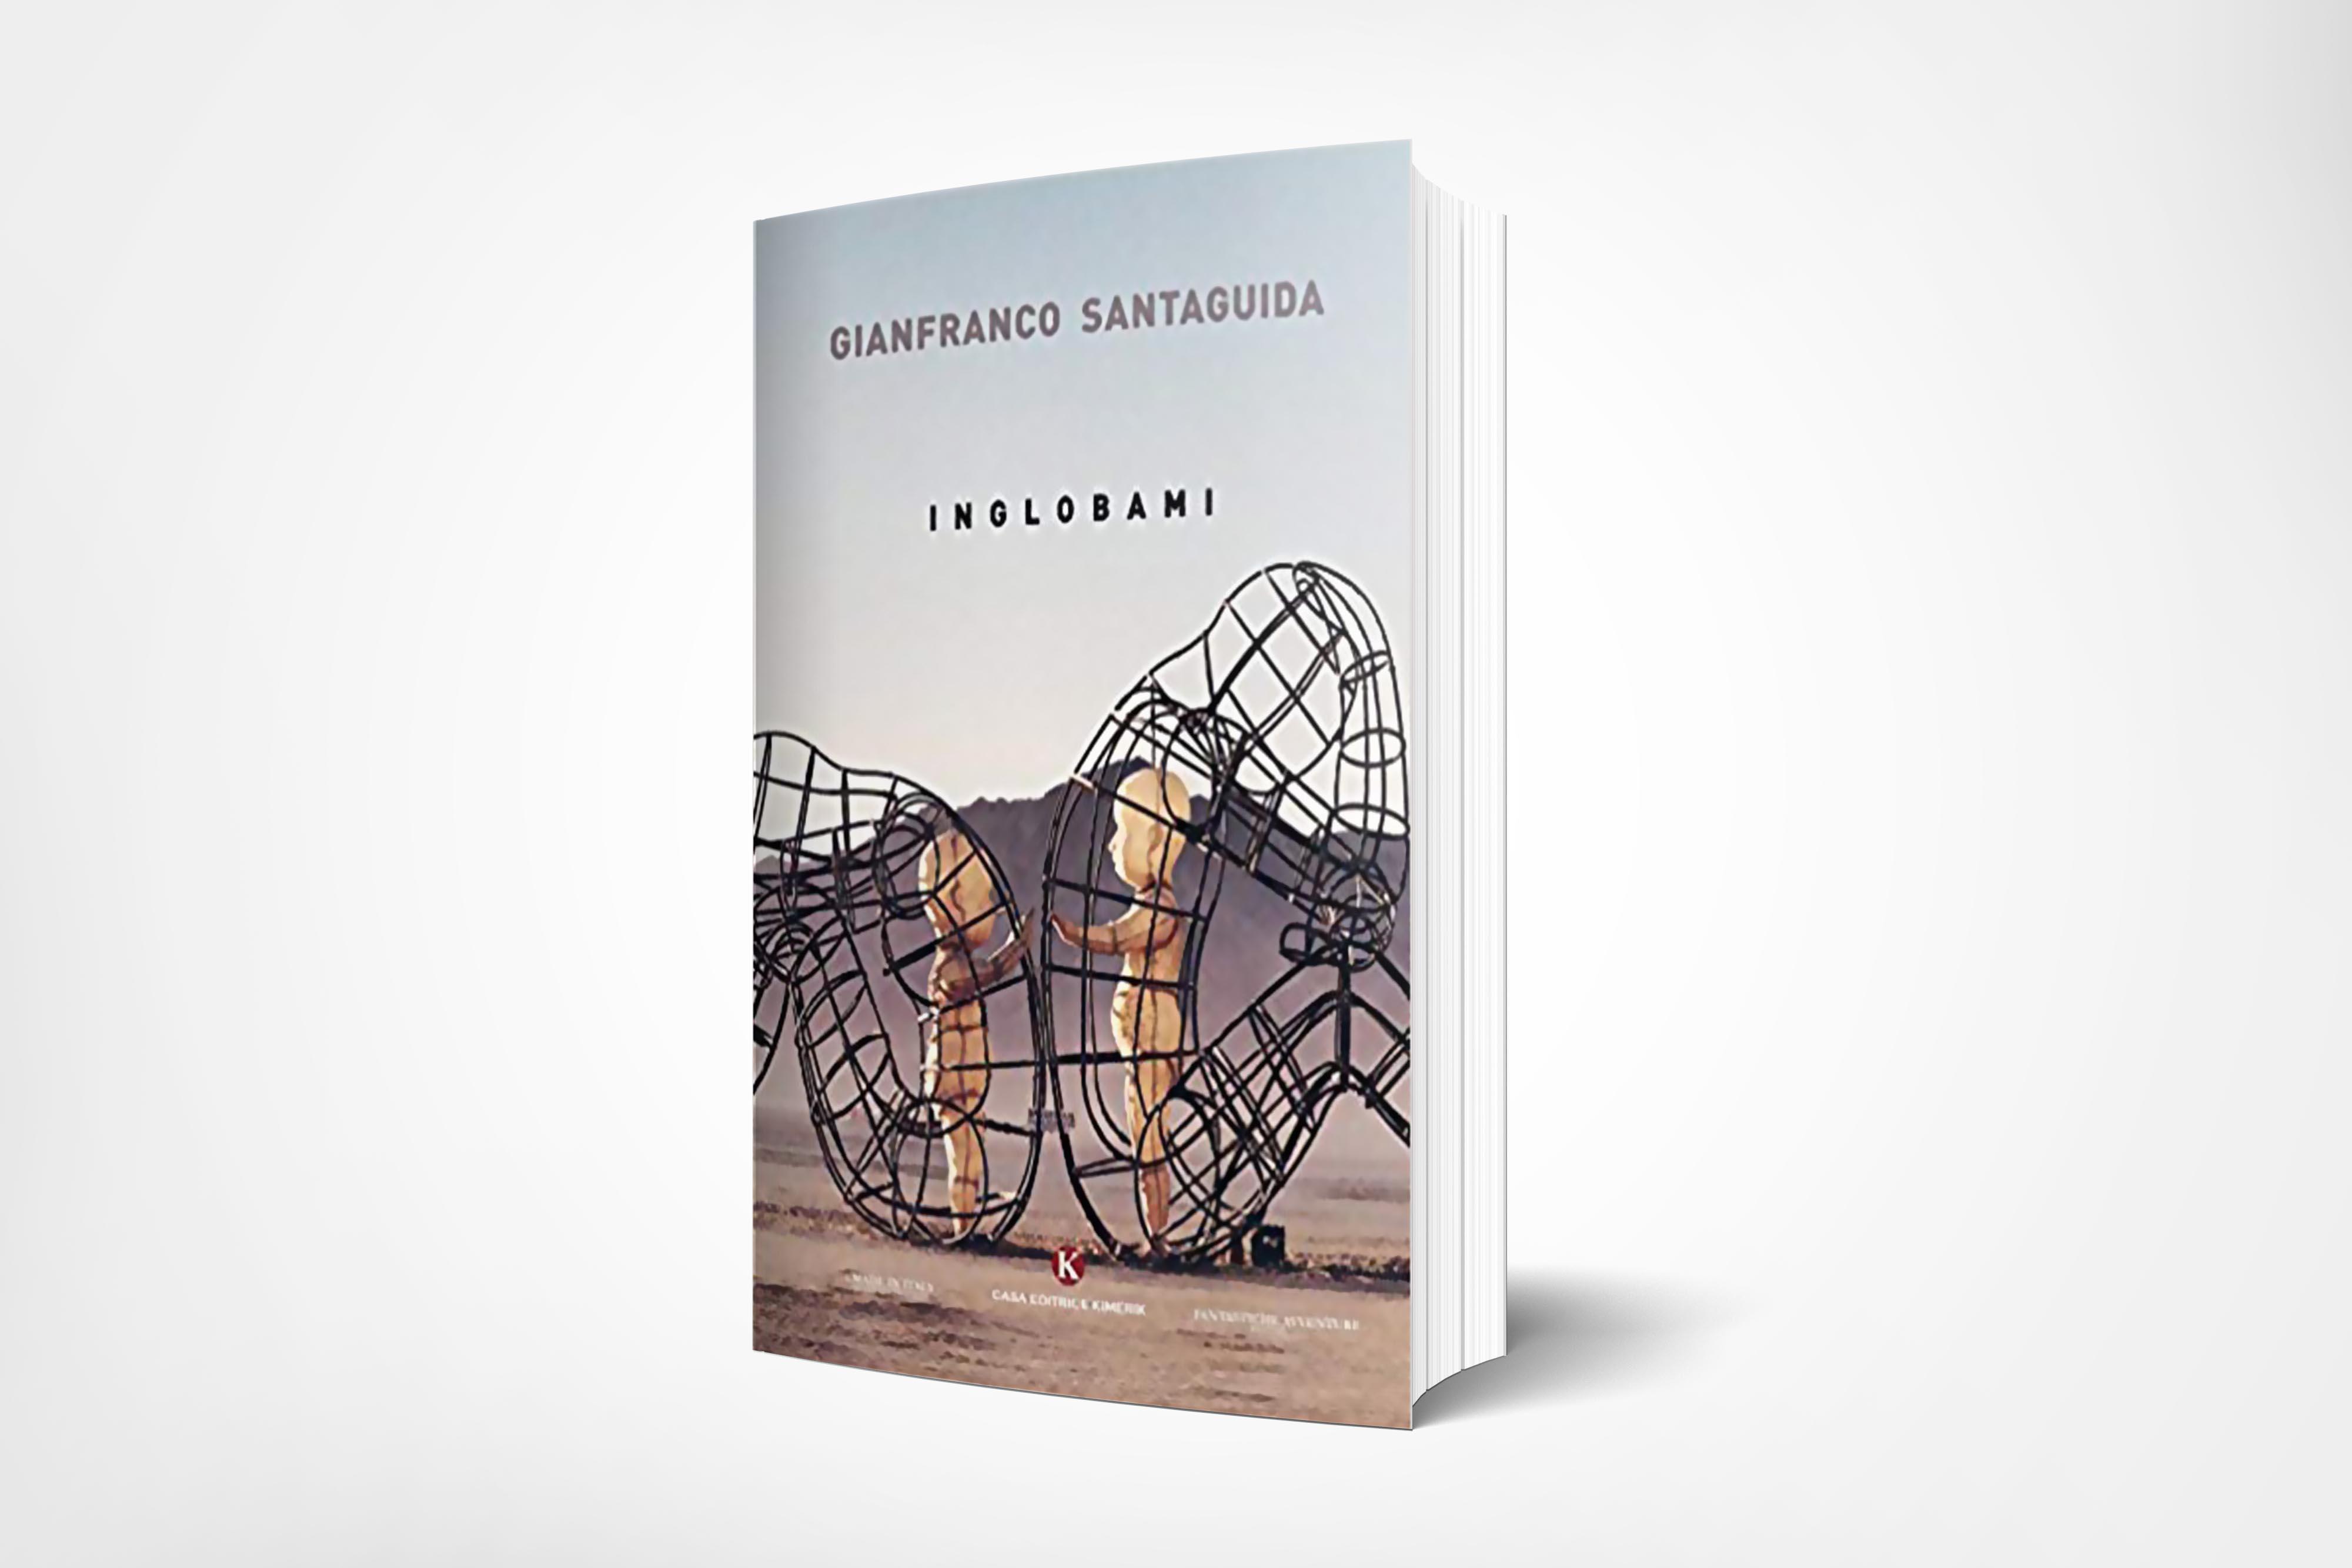 libro inglobami di Gianfranco Santaguida